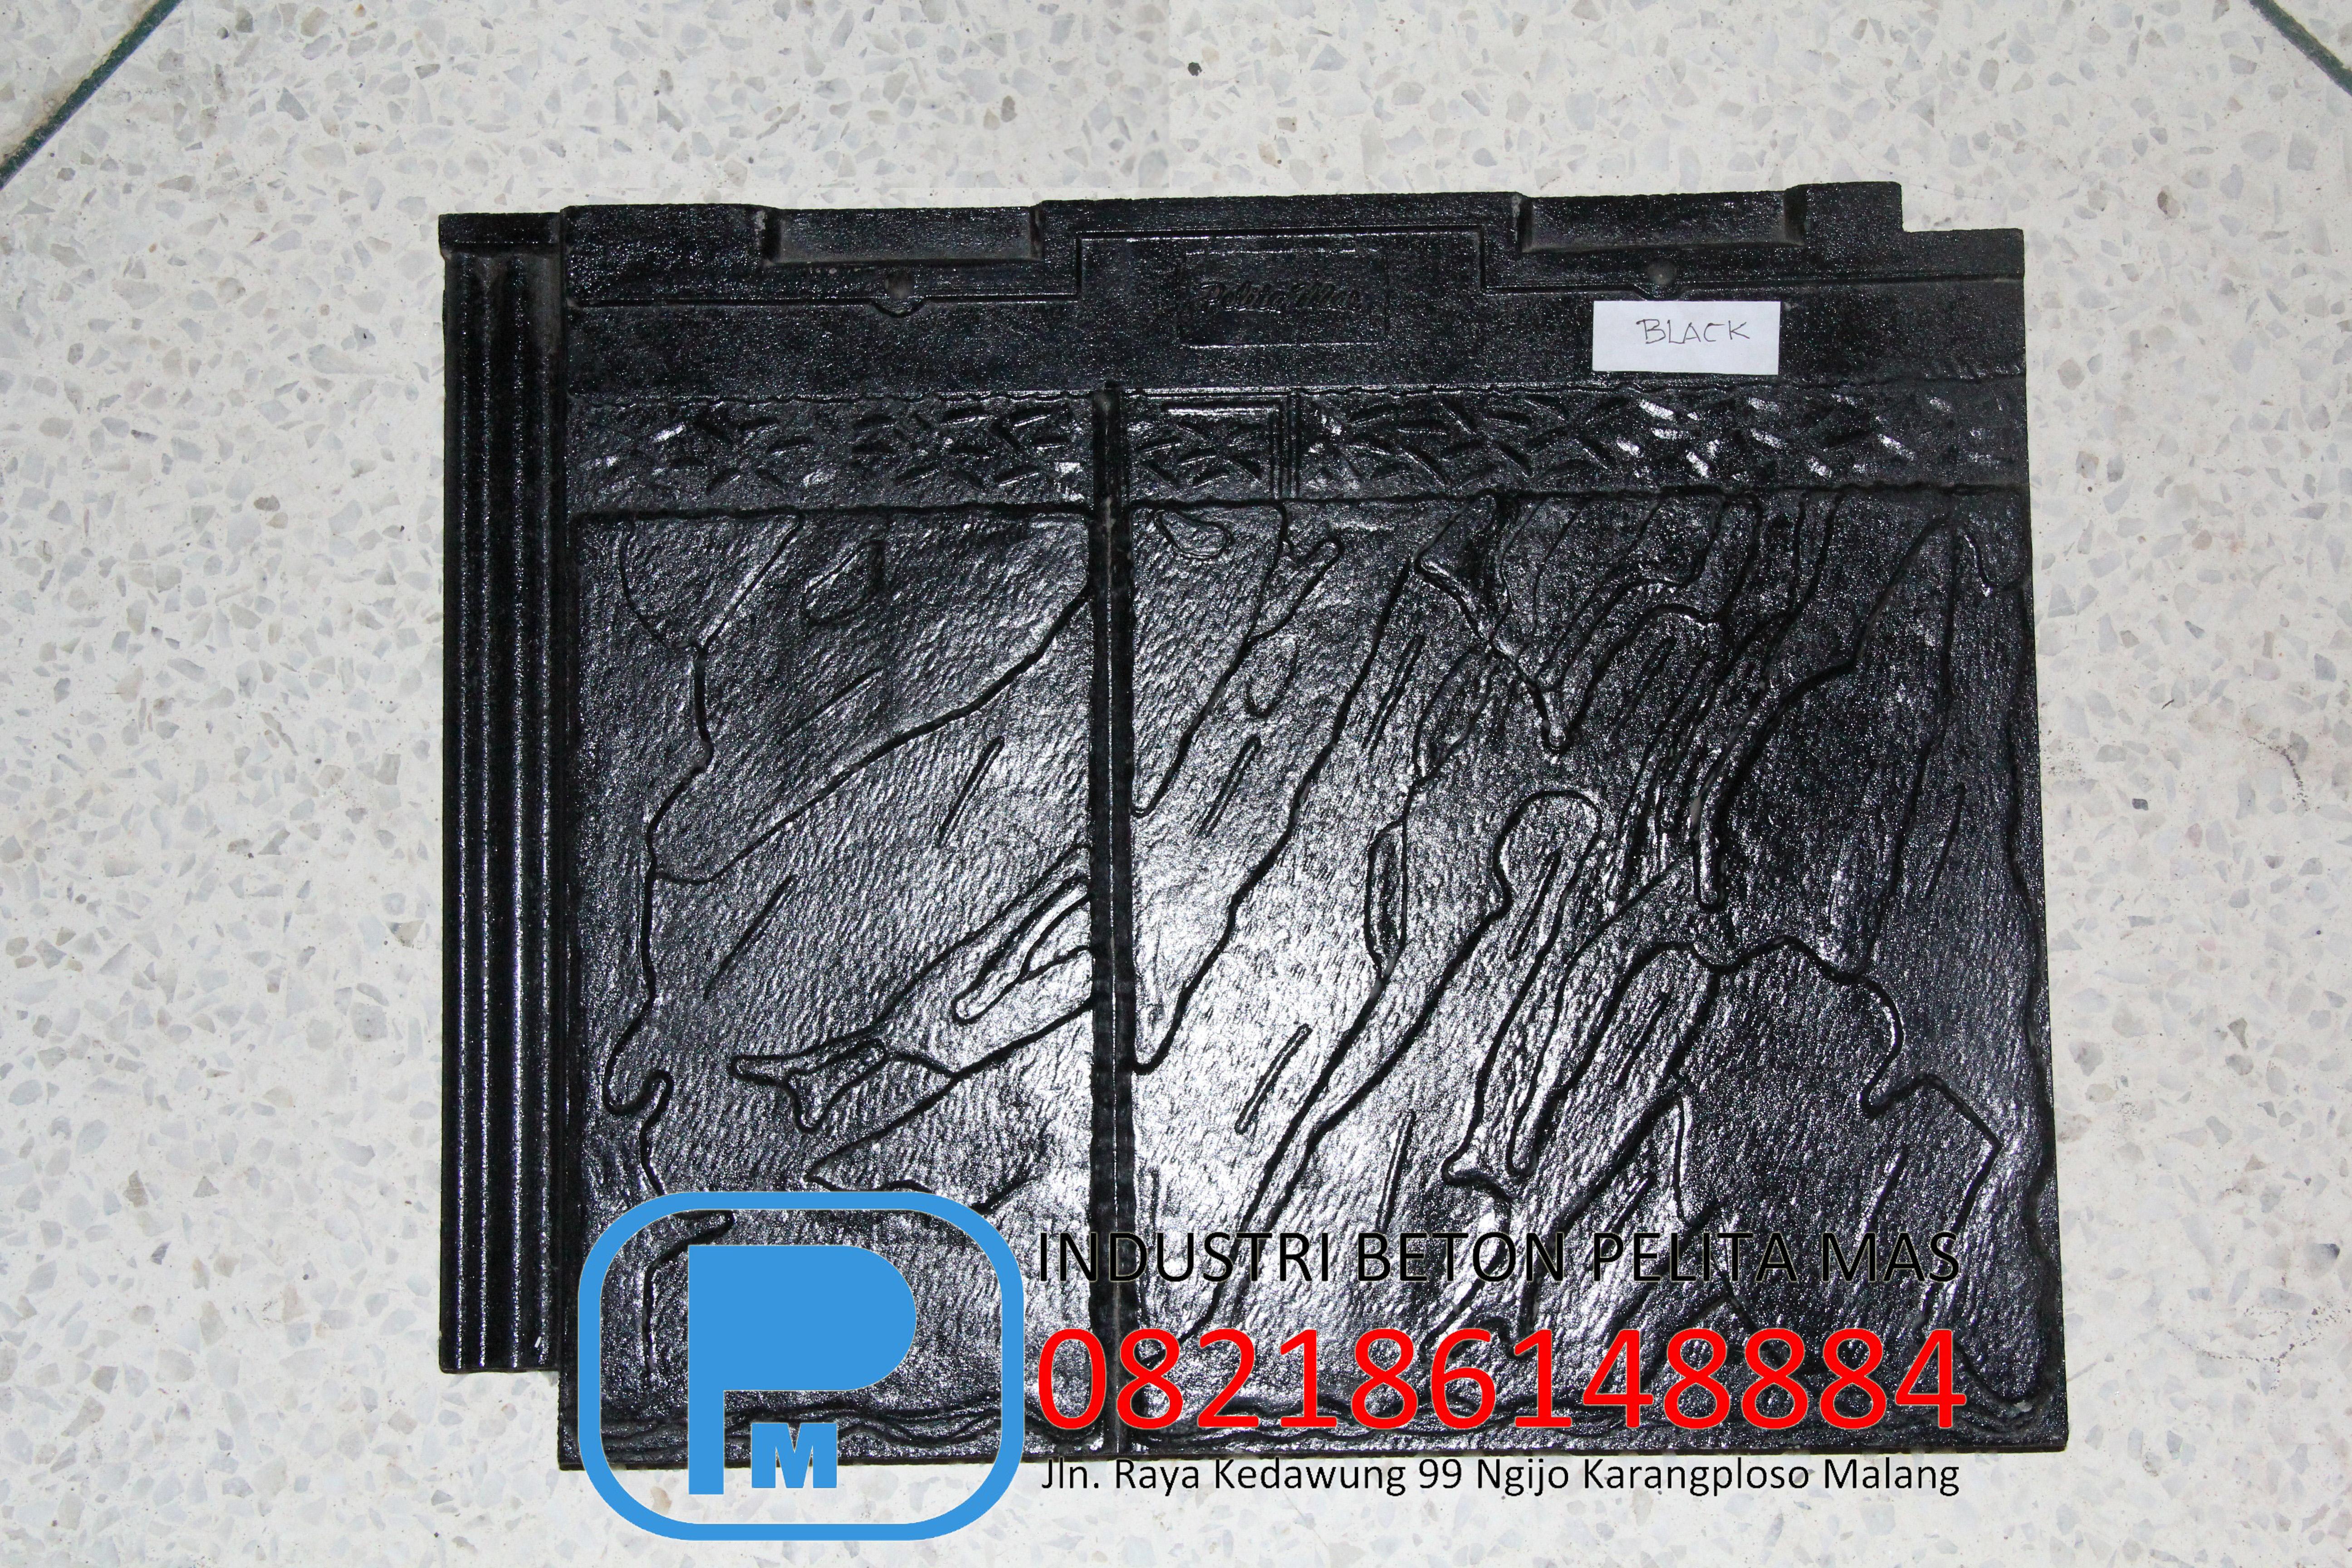 HP/WA 0821-8614-8884, Genteng Beton Flat